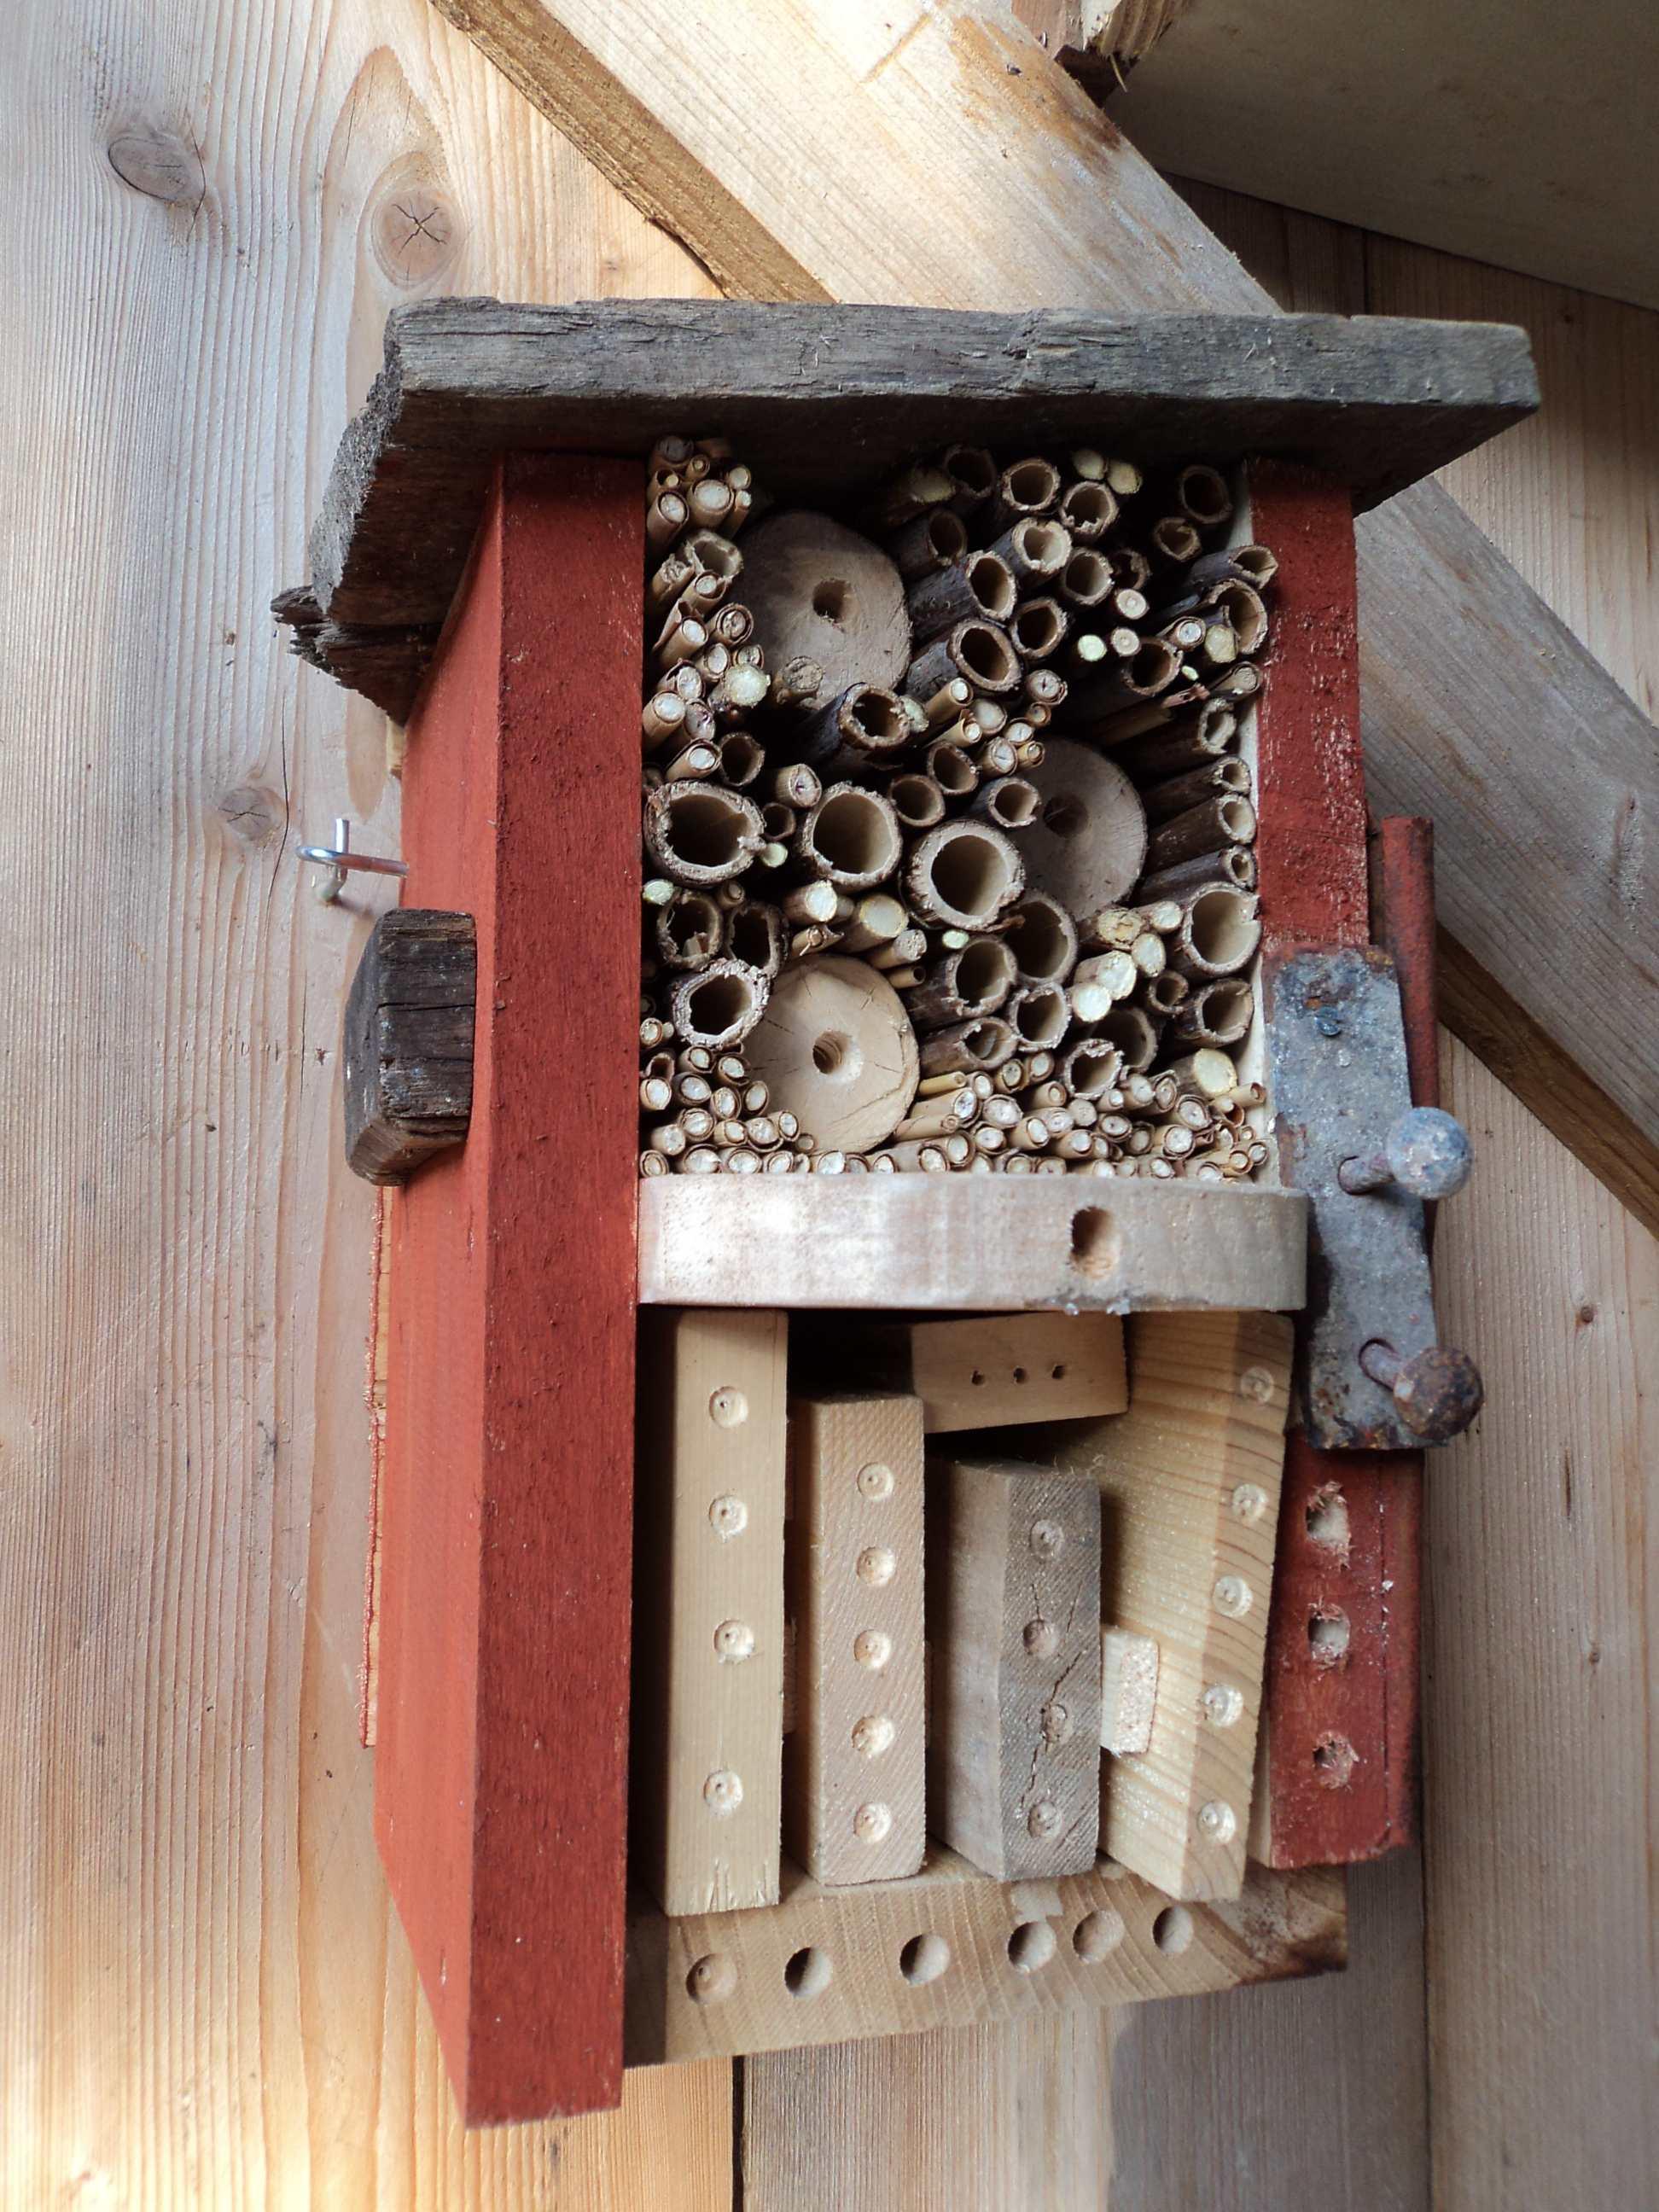 nichoirs a insectes le jardin des petites ruches. Black Bedroom Furniture Sets. Home Design Ideas